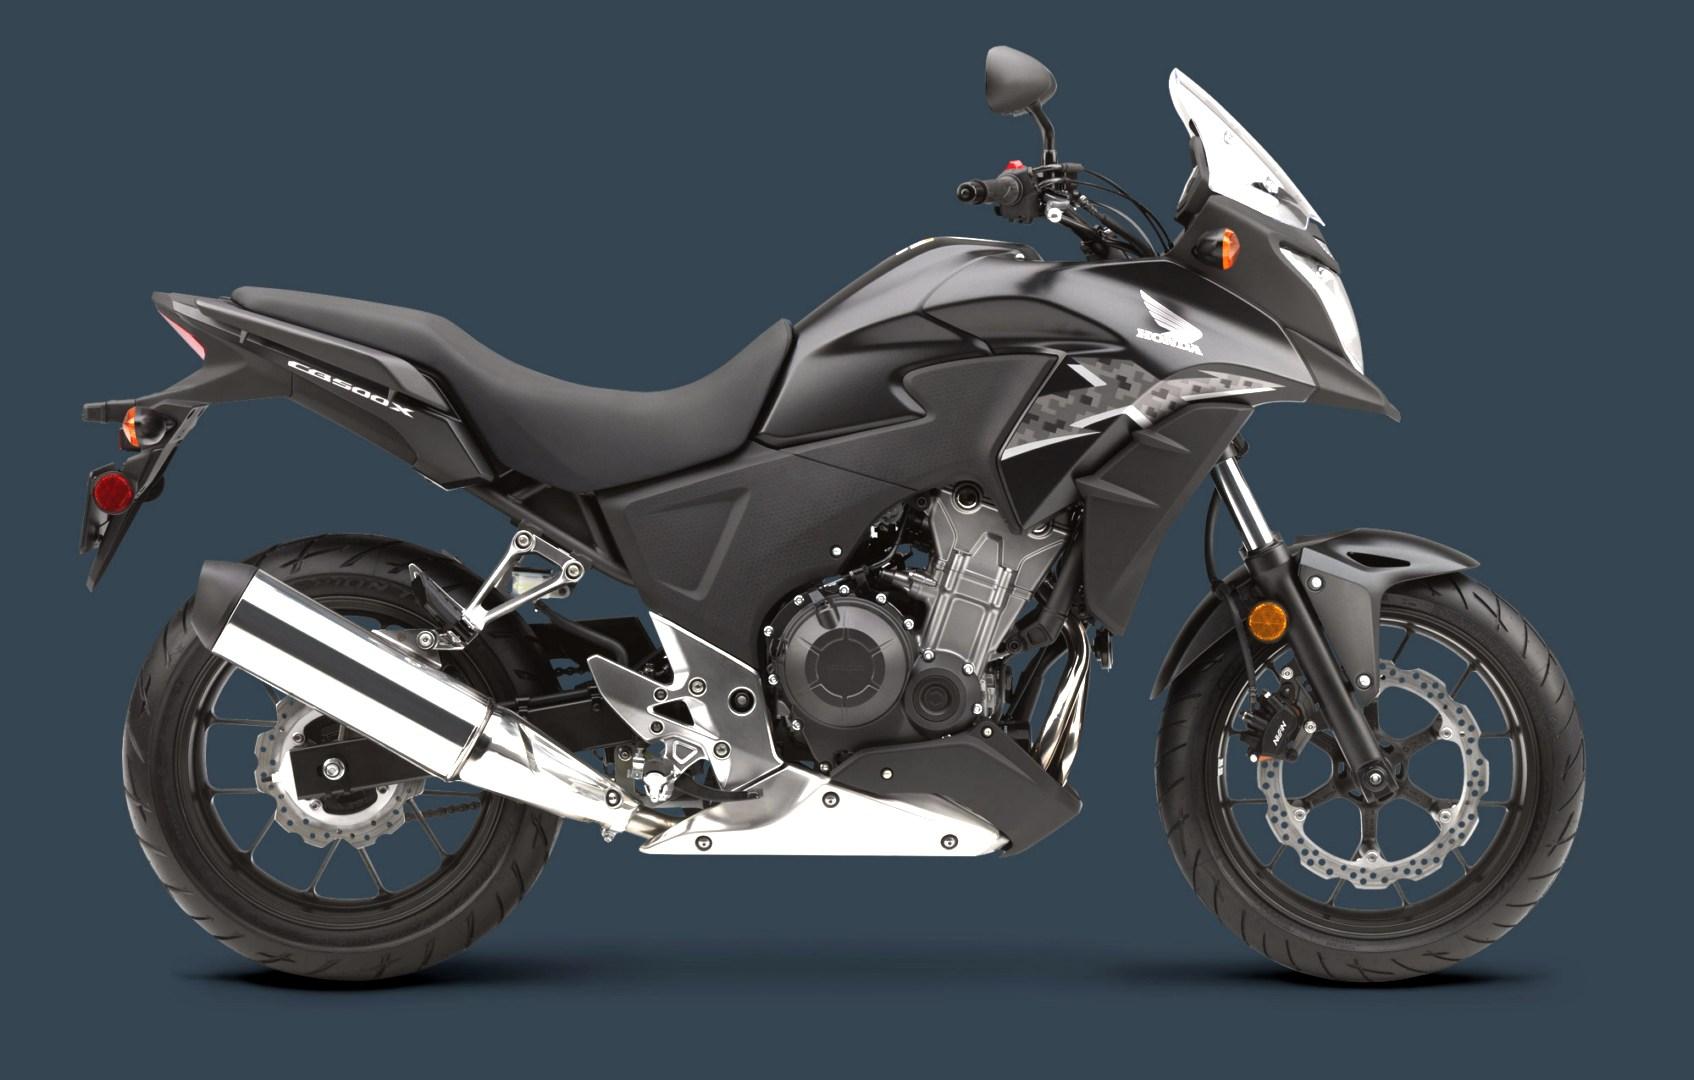 2013 honda cb500x the new middleweight versatile bike. Black Bedroom Furniture Sets. Home Design Ideas